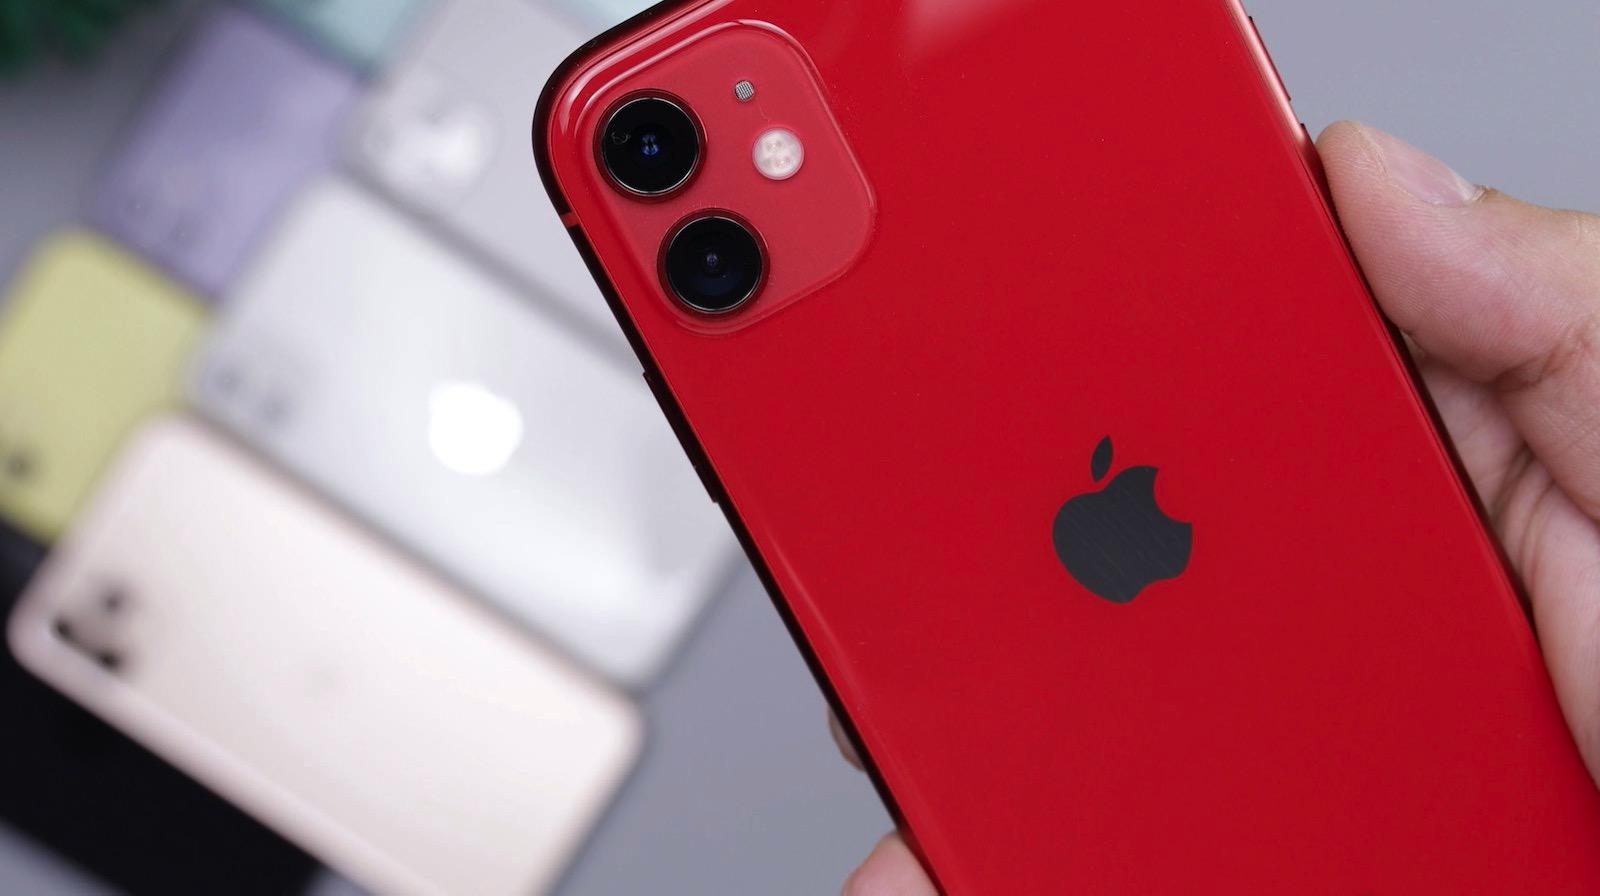 daniel-romero-9lpdQNR8Vqk-unsplash-iphone-11-red.jpg